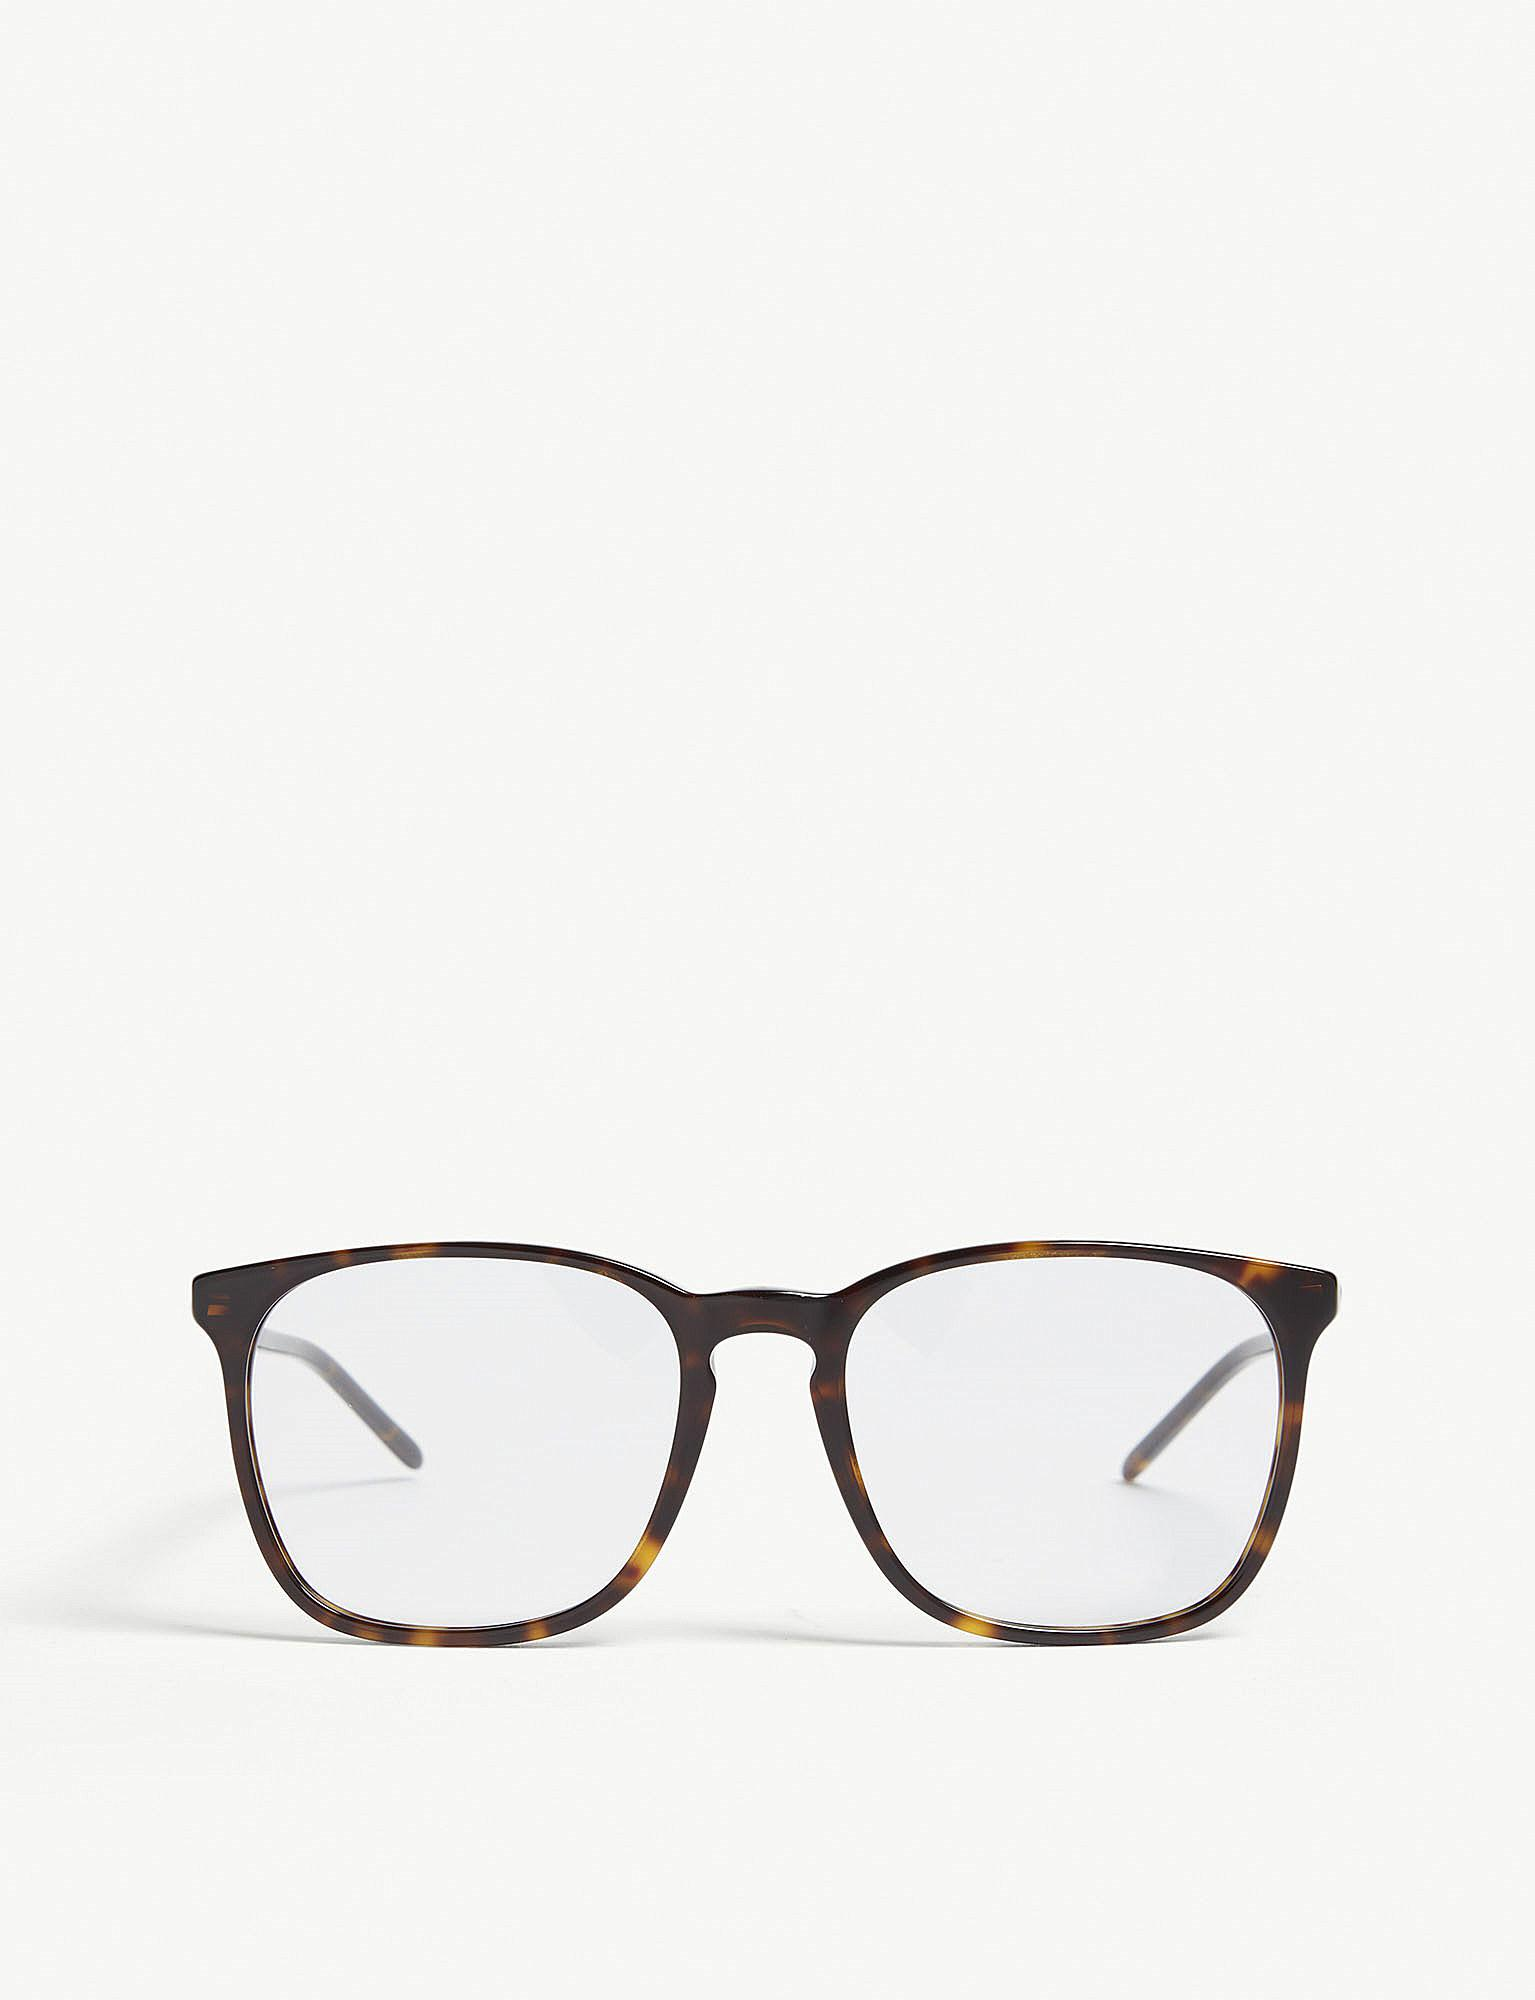 0dd097da3a Ray-Ban Rx5387 Square-frame Optical Glasses for Men - Lyst